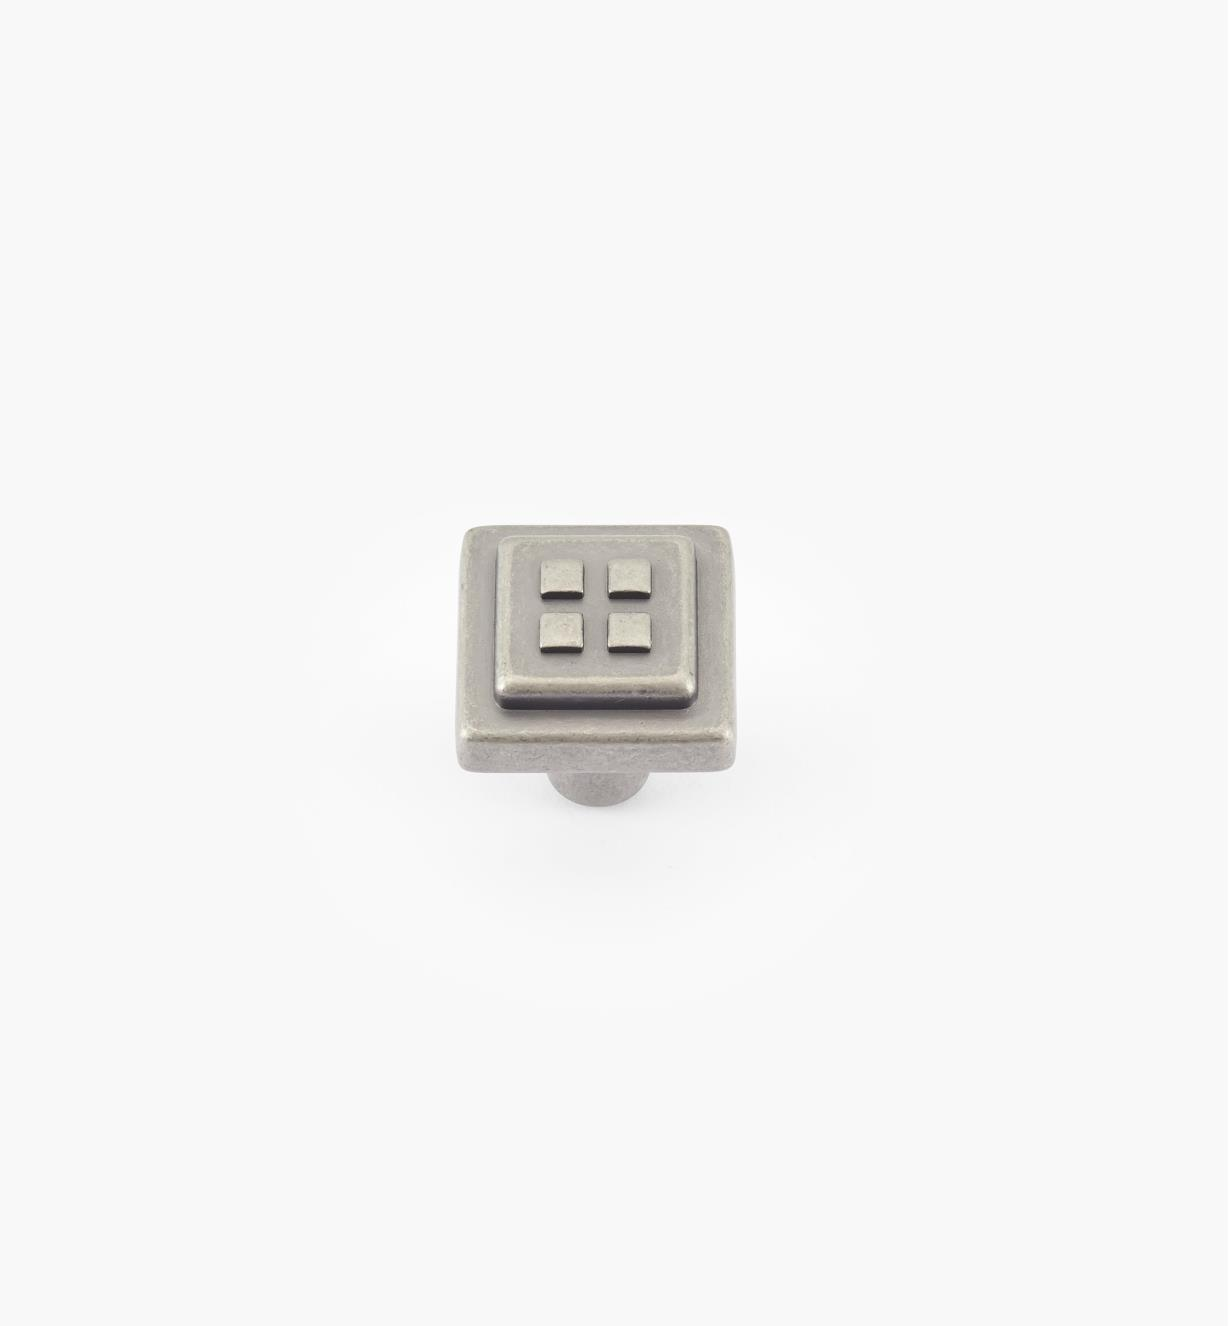 02A0962 - Bouton à carrés Forgings, fini nickel vieilli, 1 1/8 po x 1 1/8 po